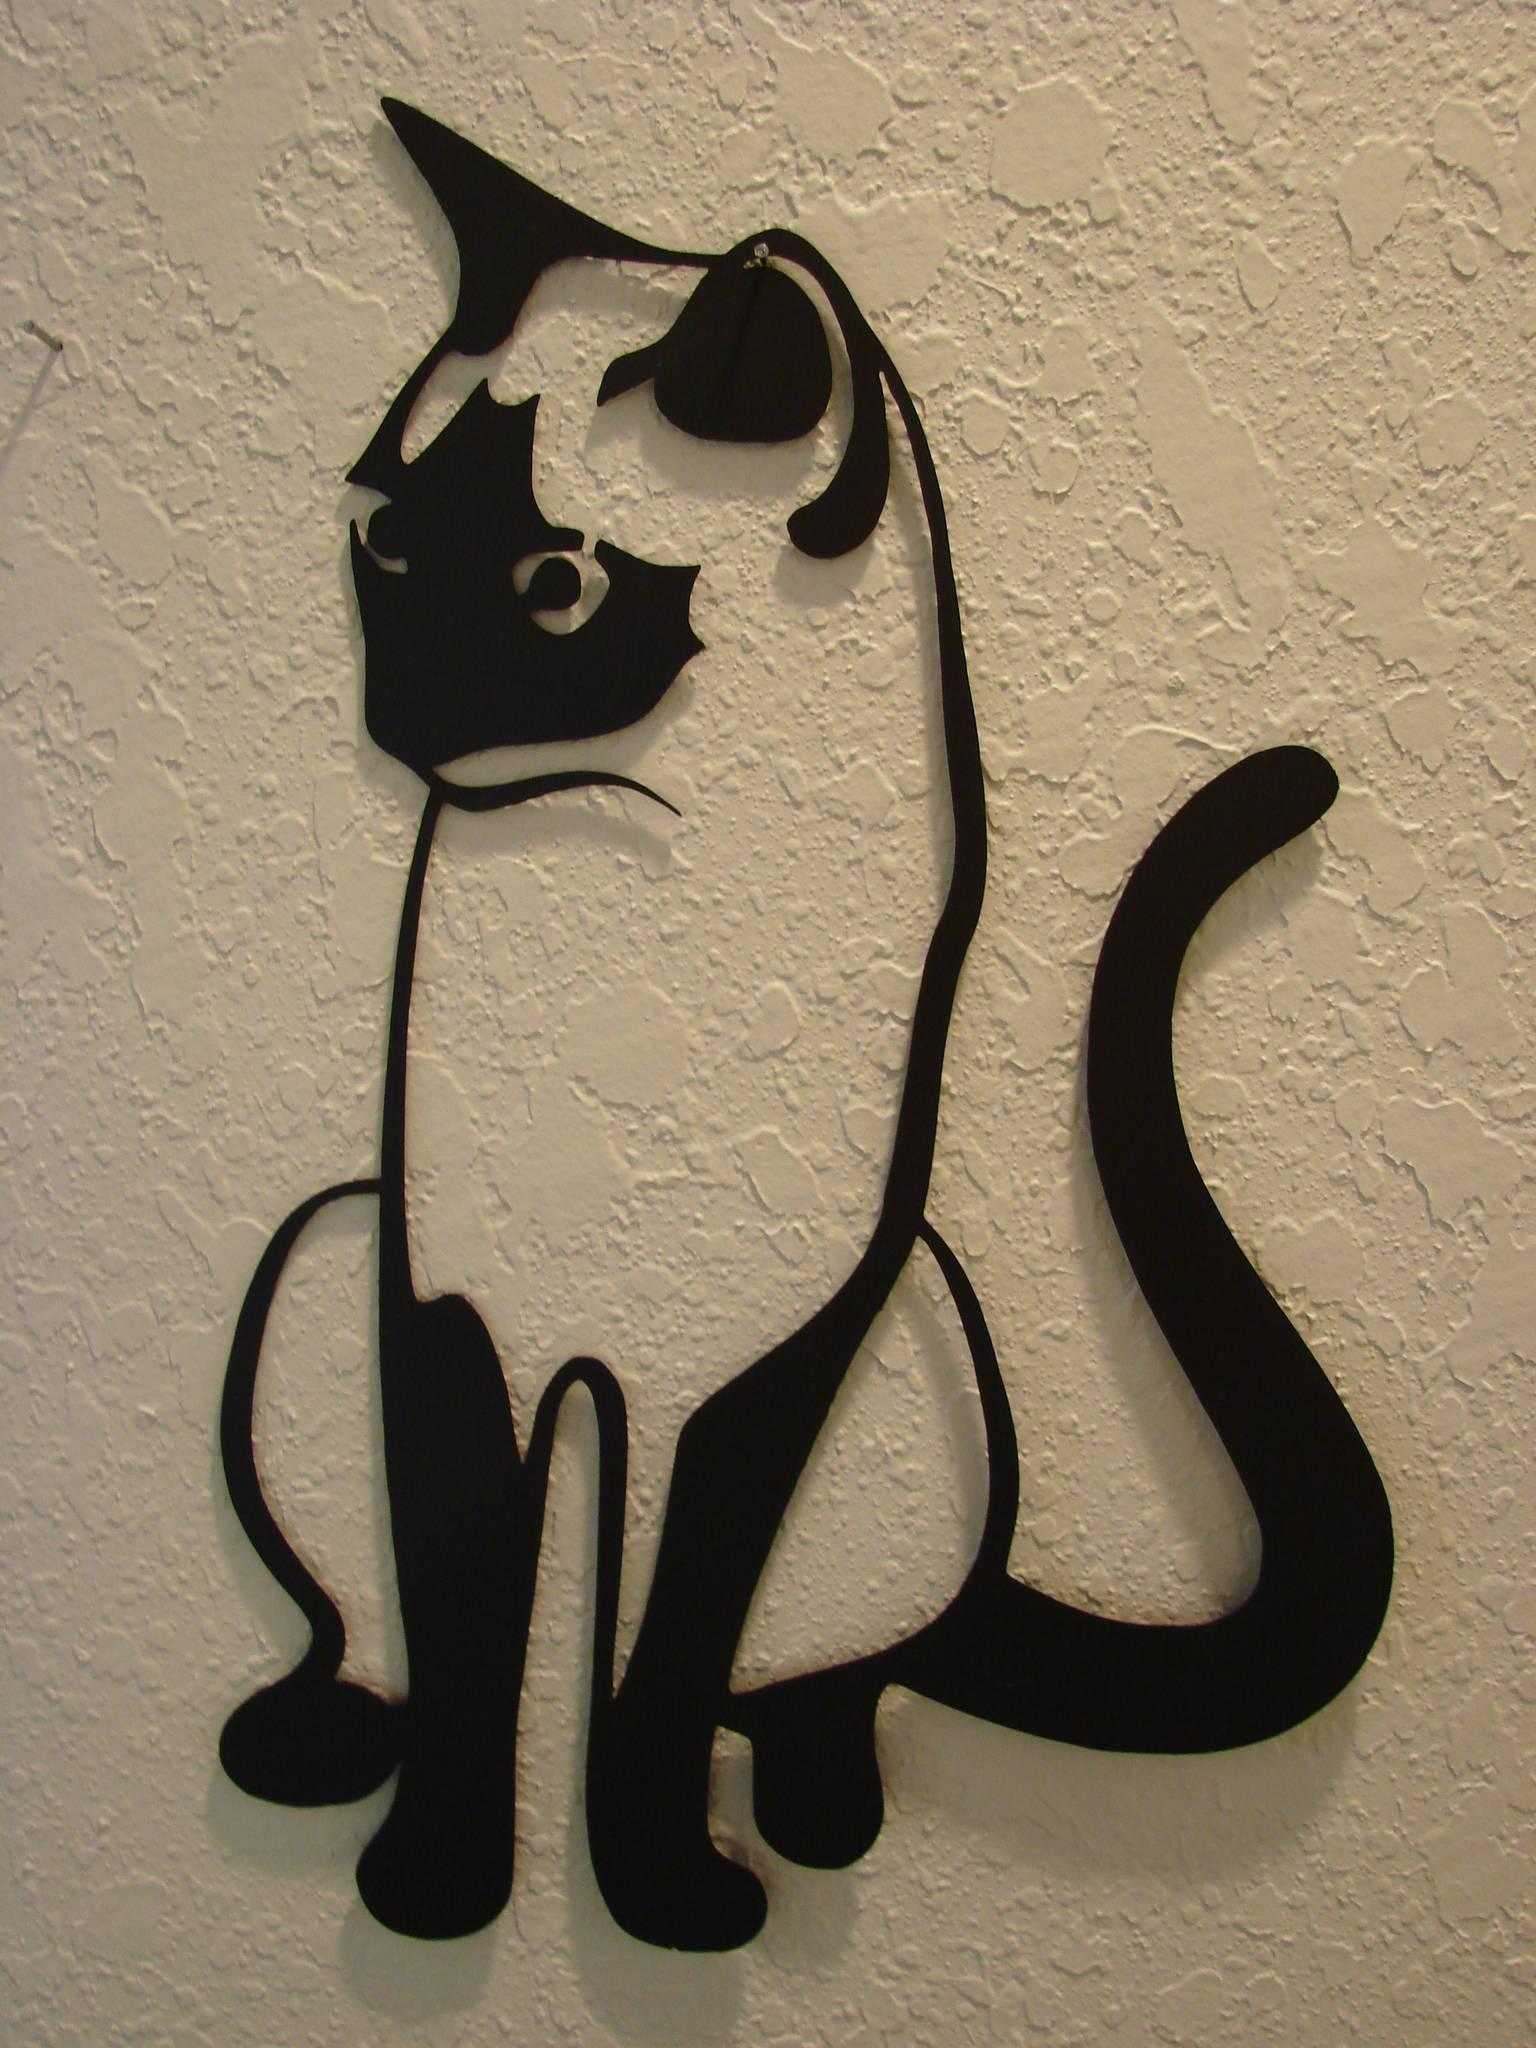 16 Gauge Plasma Cut Kitty Cat Metal Wall Art – : Inside Most Recent Plasma Cut Metal Wall Art (View 1 of 20)